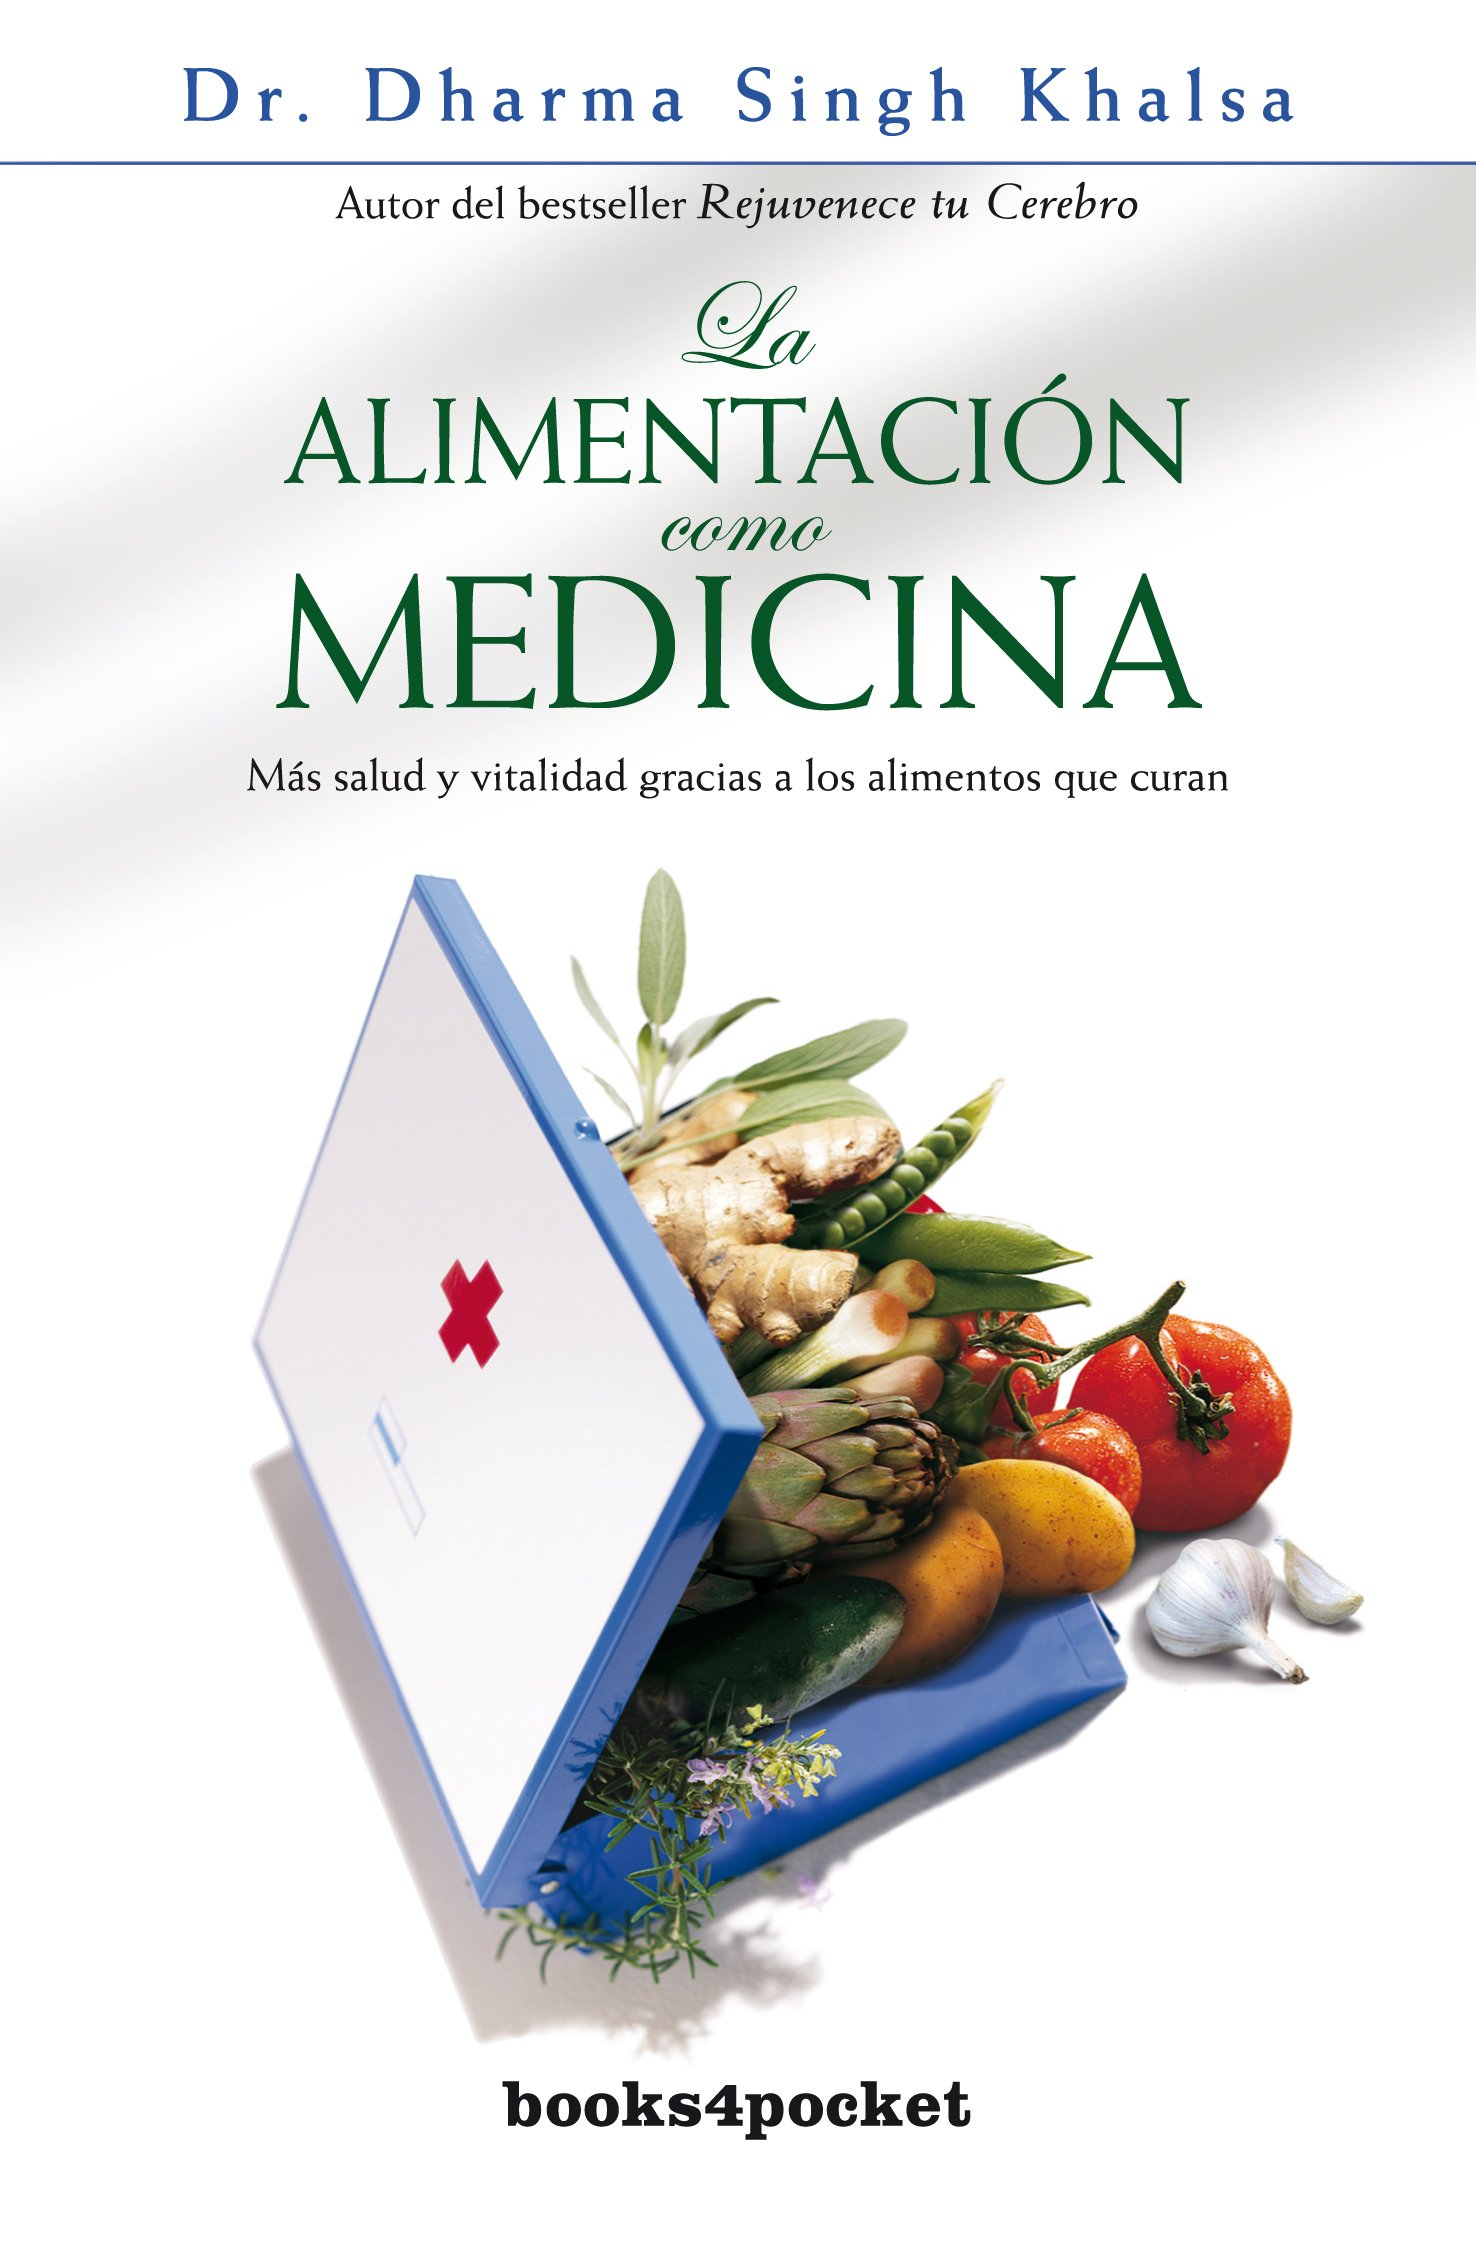 La alimentacion como medicina (Spanish Edition): Khalsa Dharma Singh: 9788492516810: Amazon.com: Books